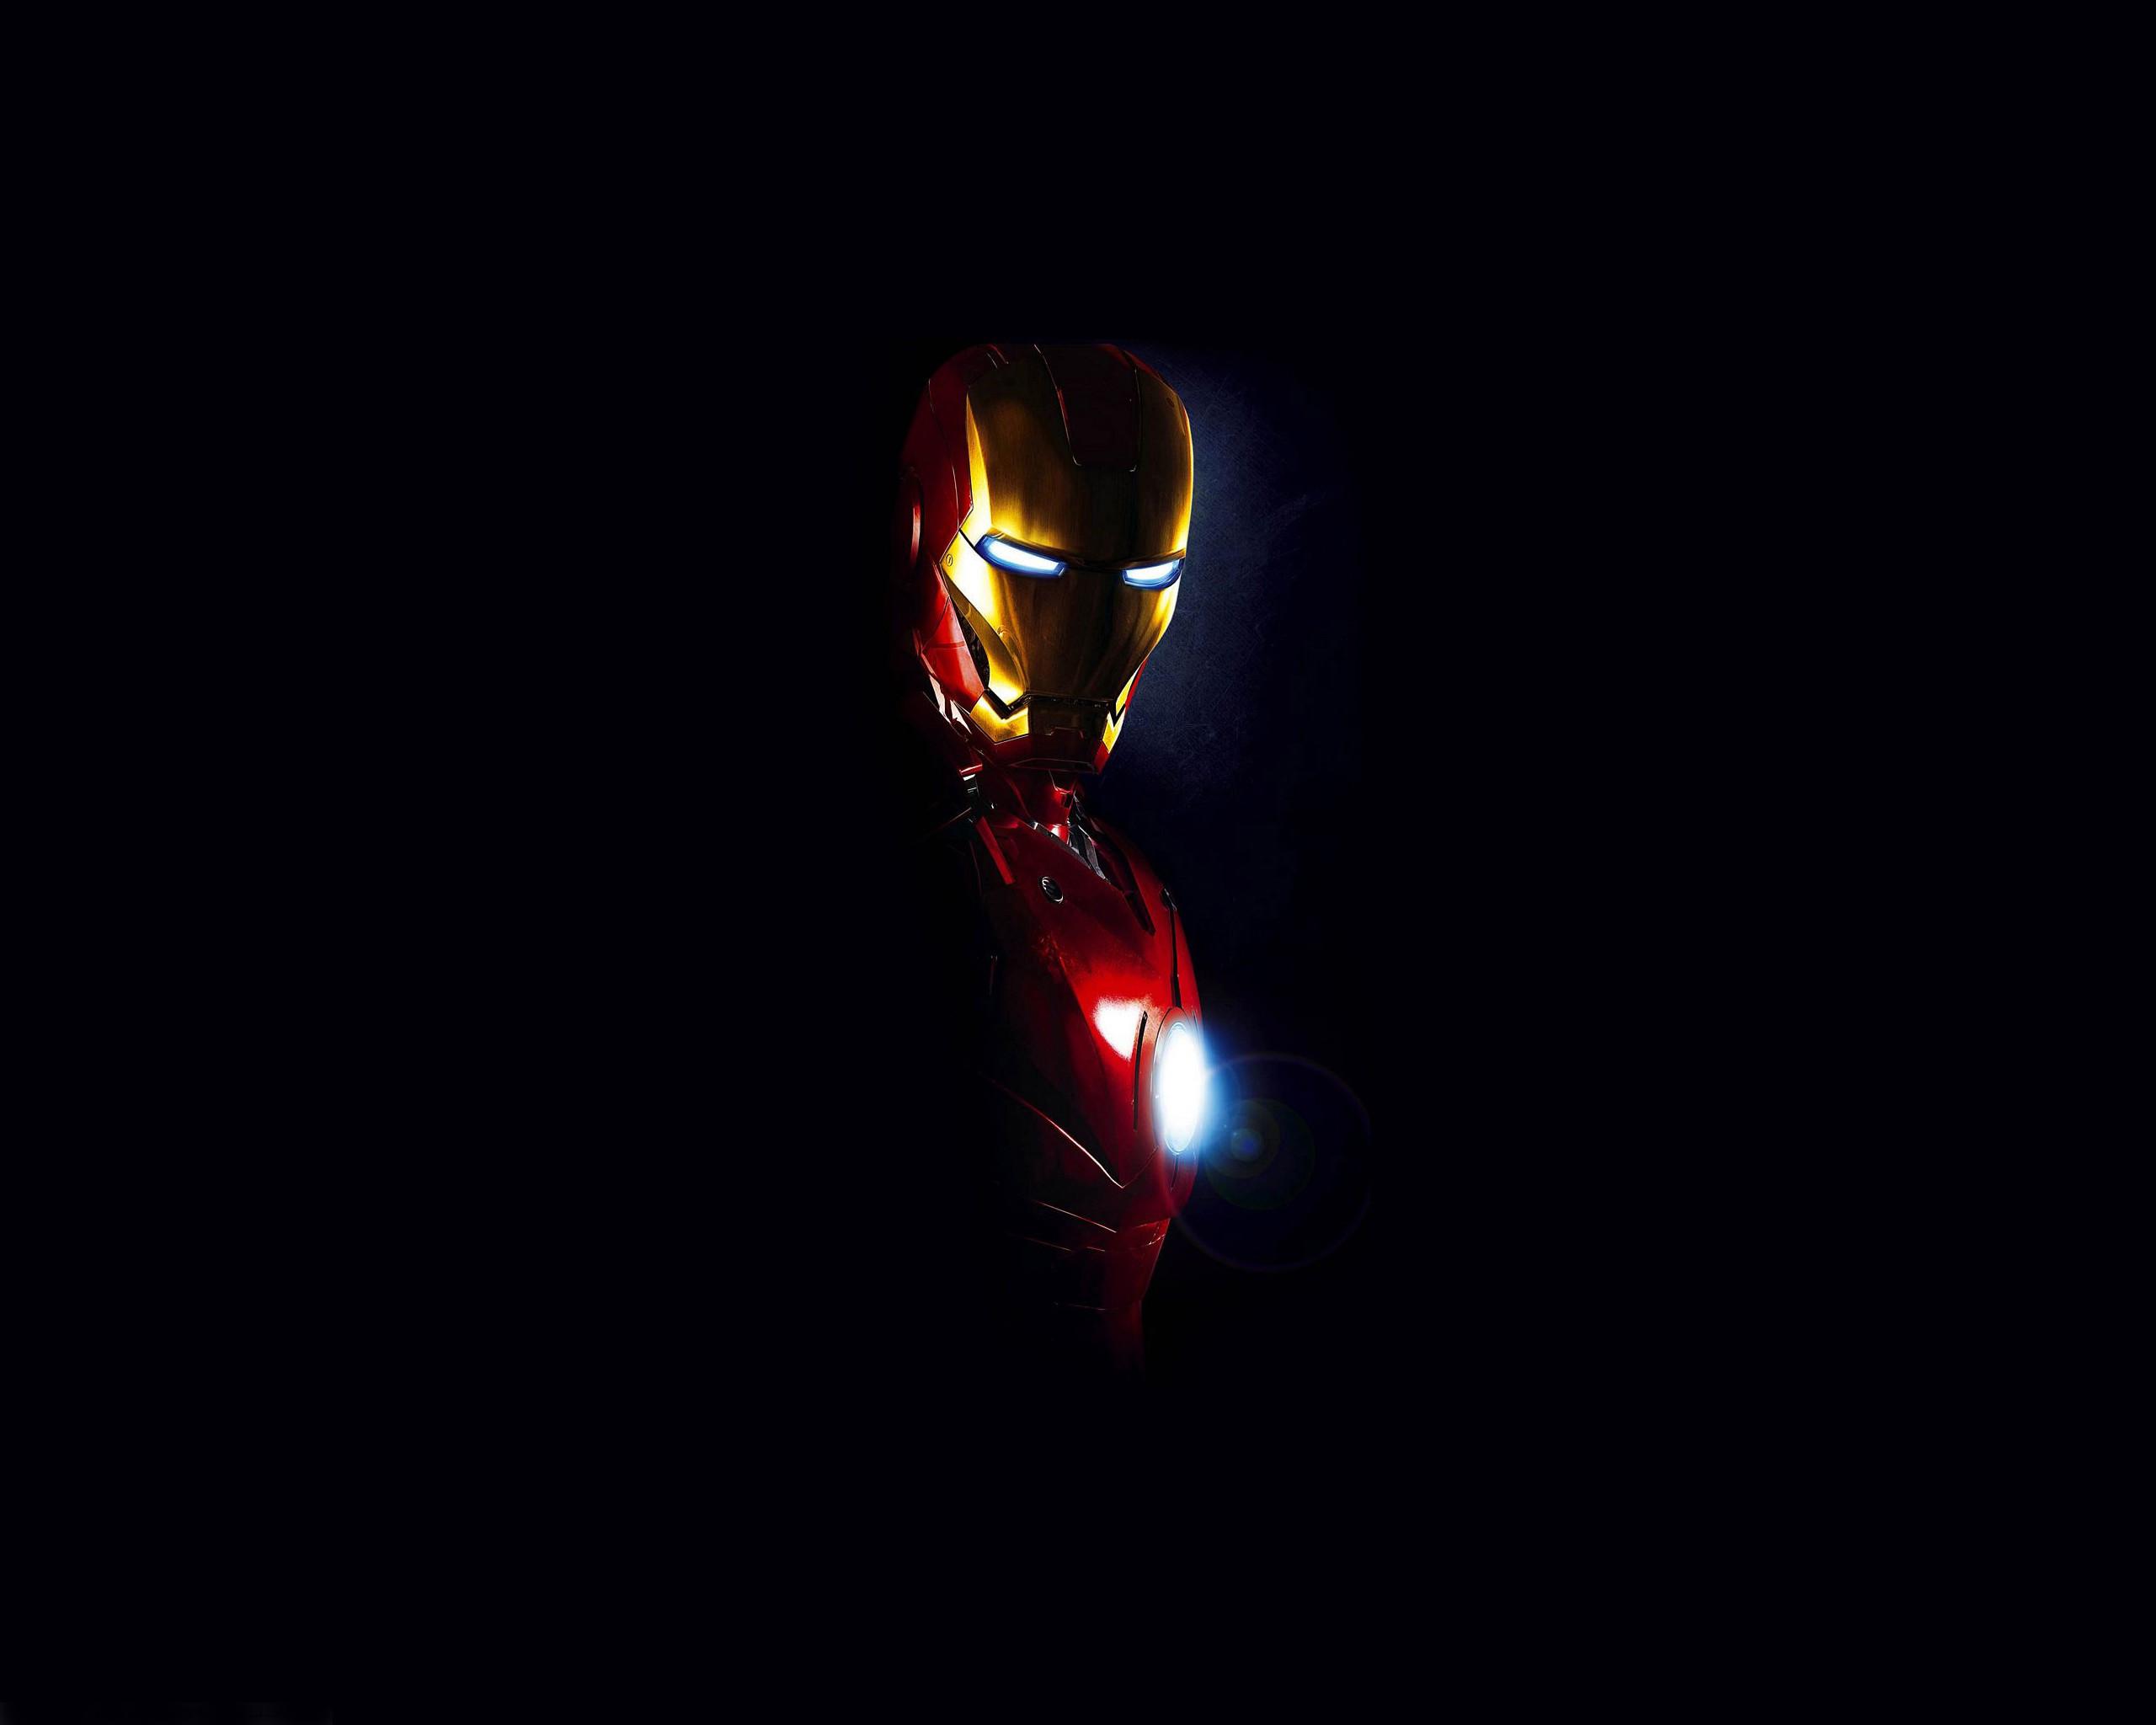 iron man screensavers and